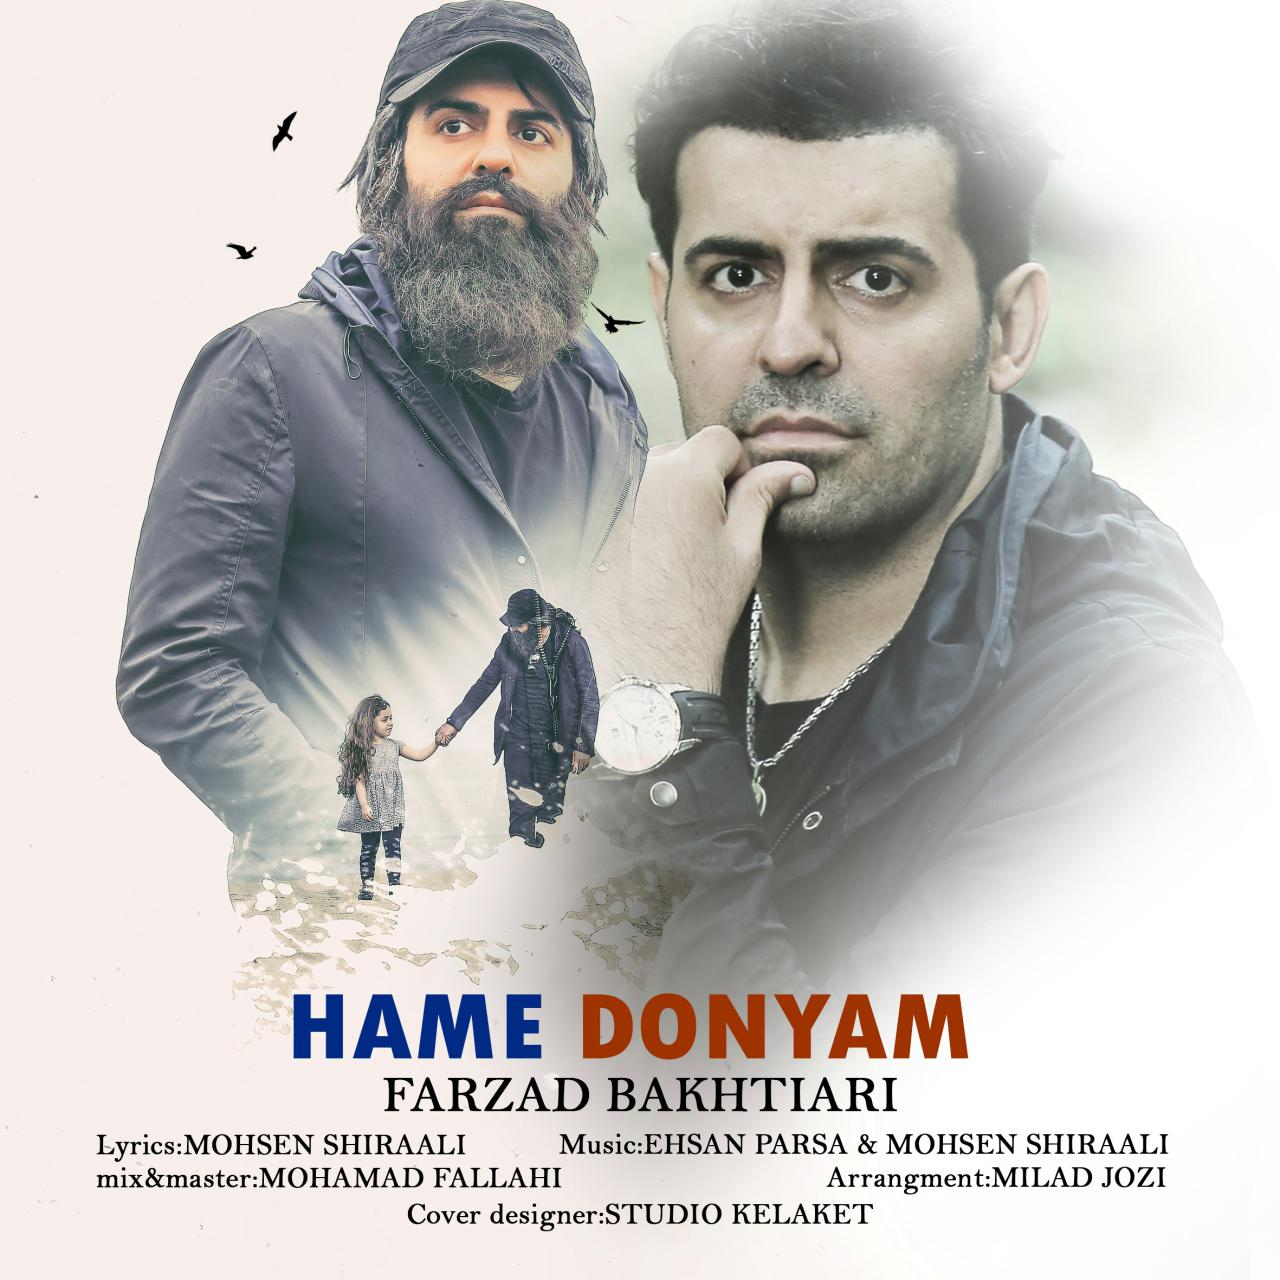 Farzad Bakhtiari – Hame Donyam